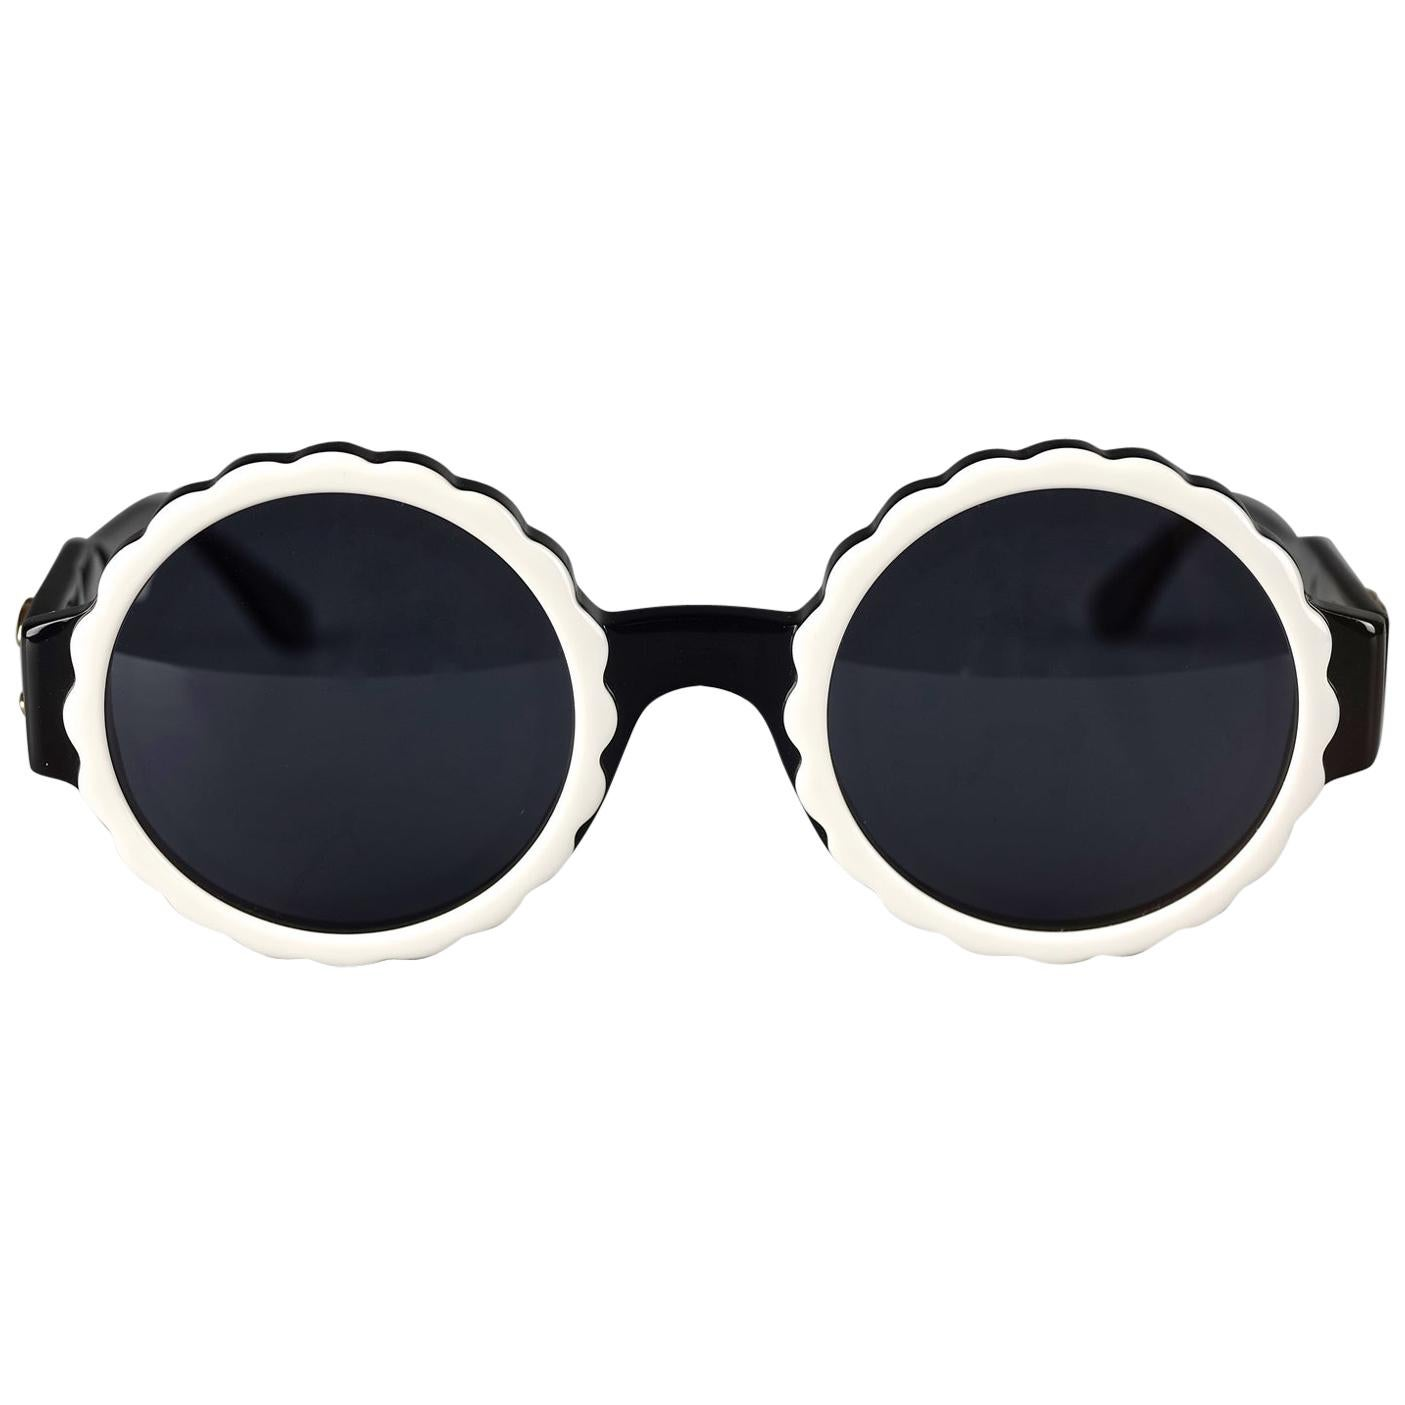 Vintage 1993 Iconic CHANEL PARIS Camellia Flower Round Sunglasses